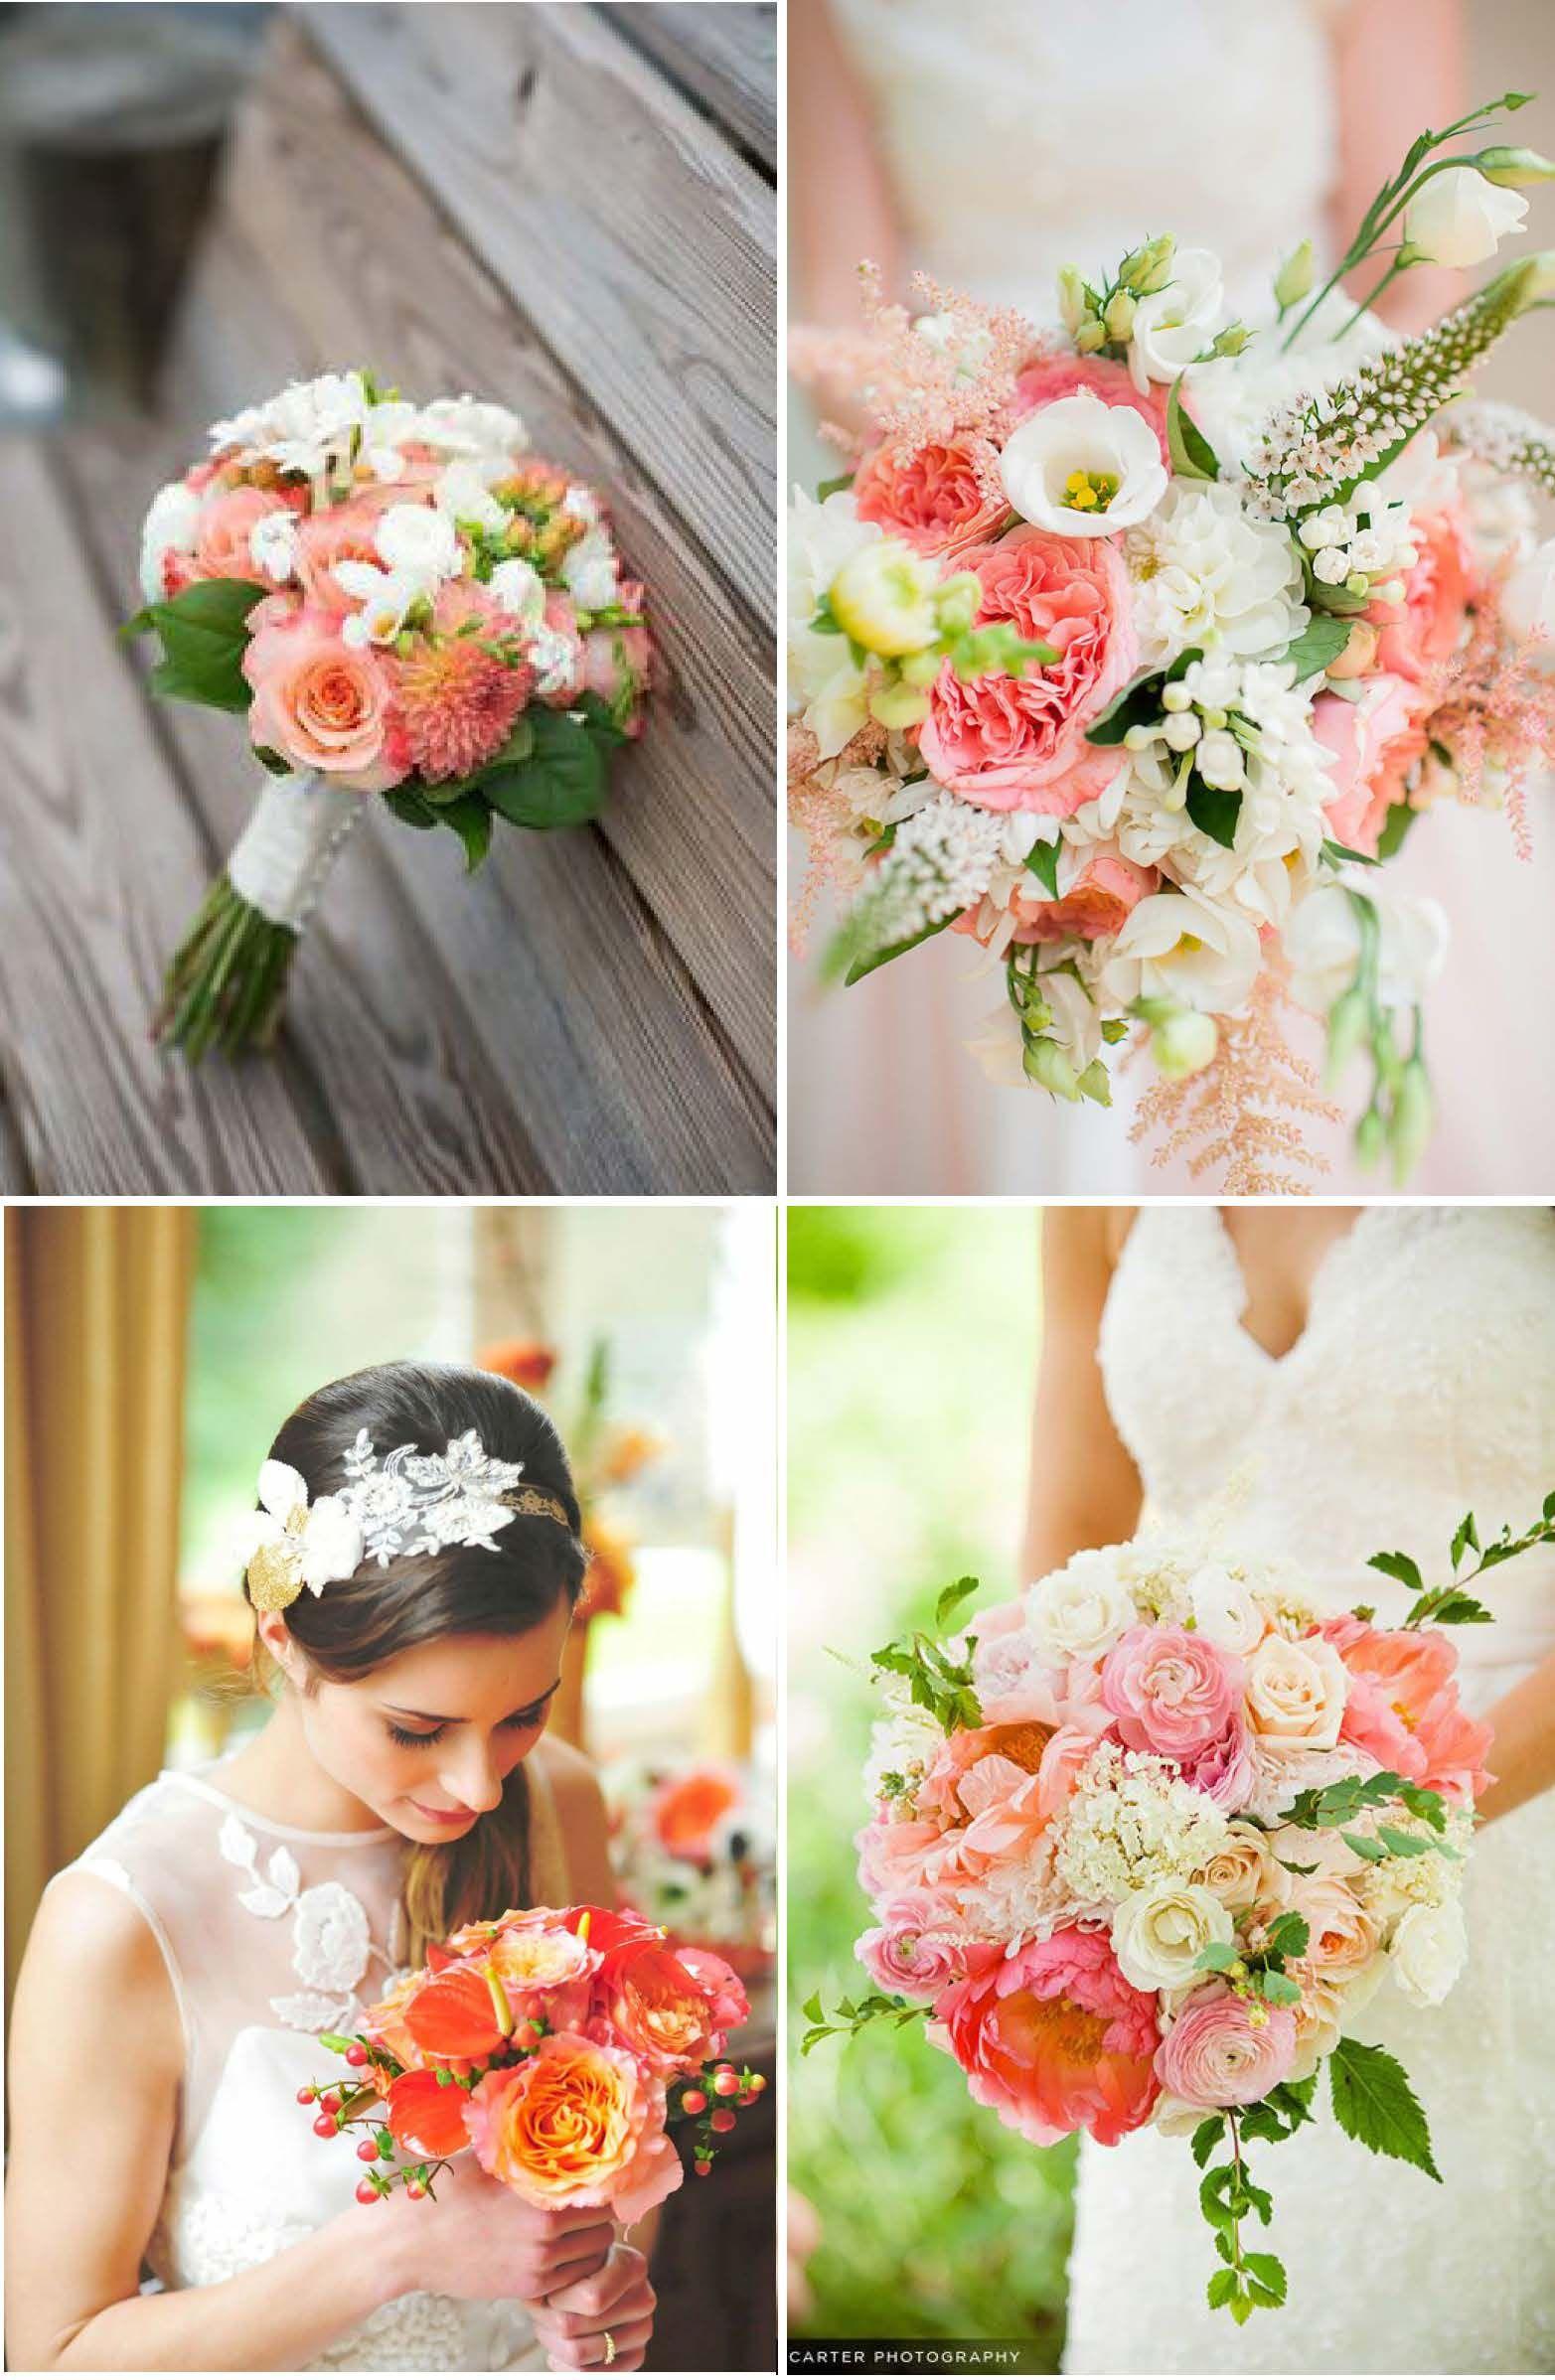 Pin von Tonya McNaughton auf weddings  Wedding bouquets